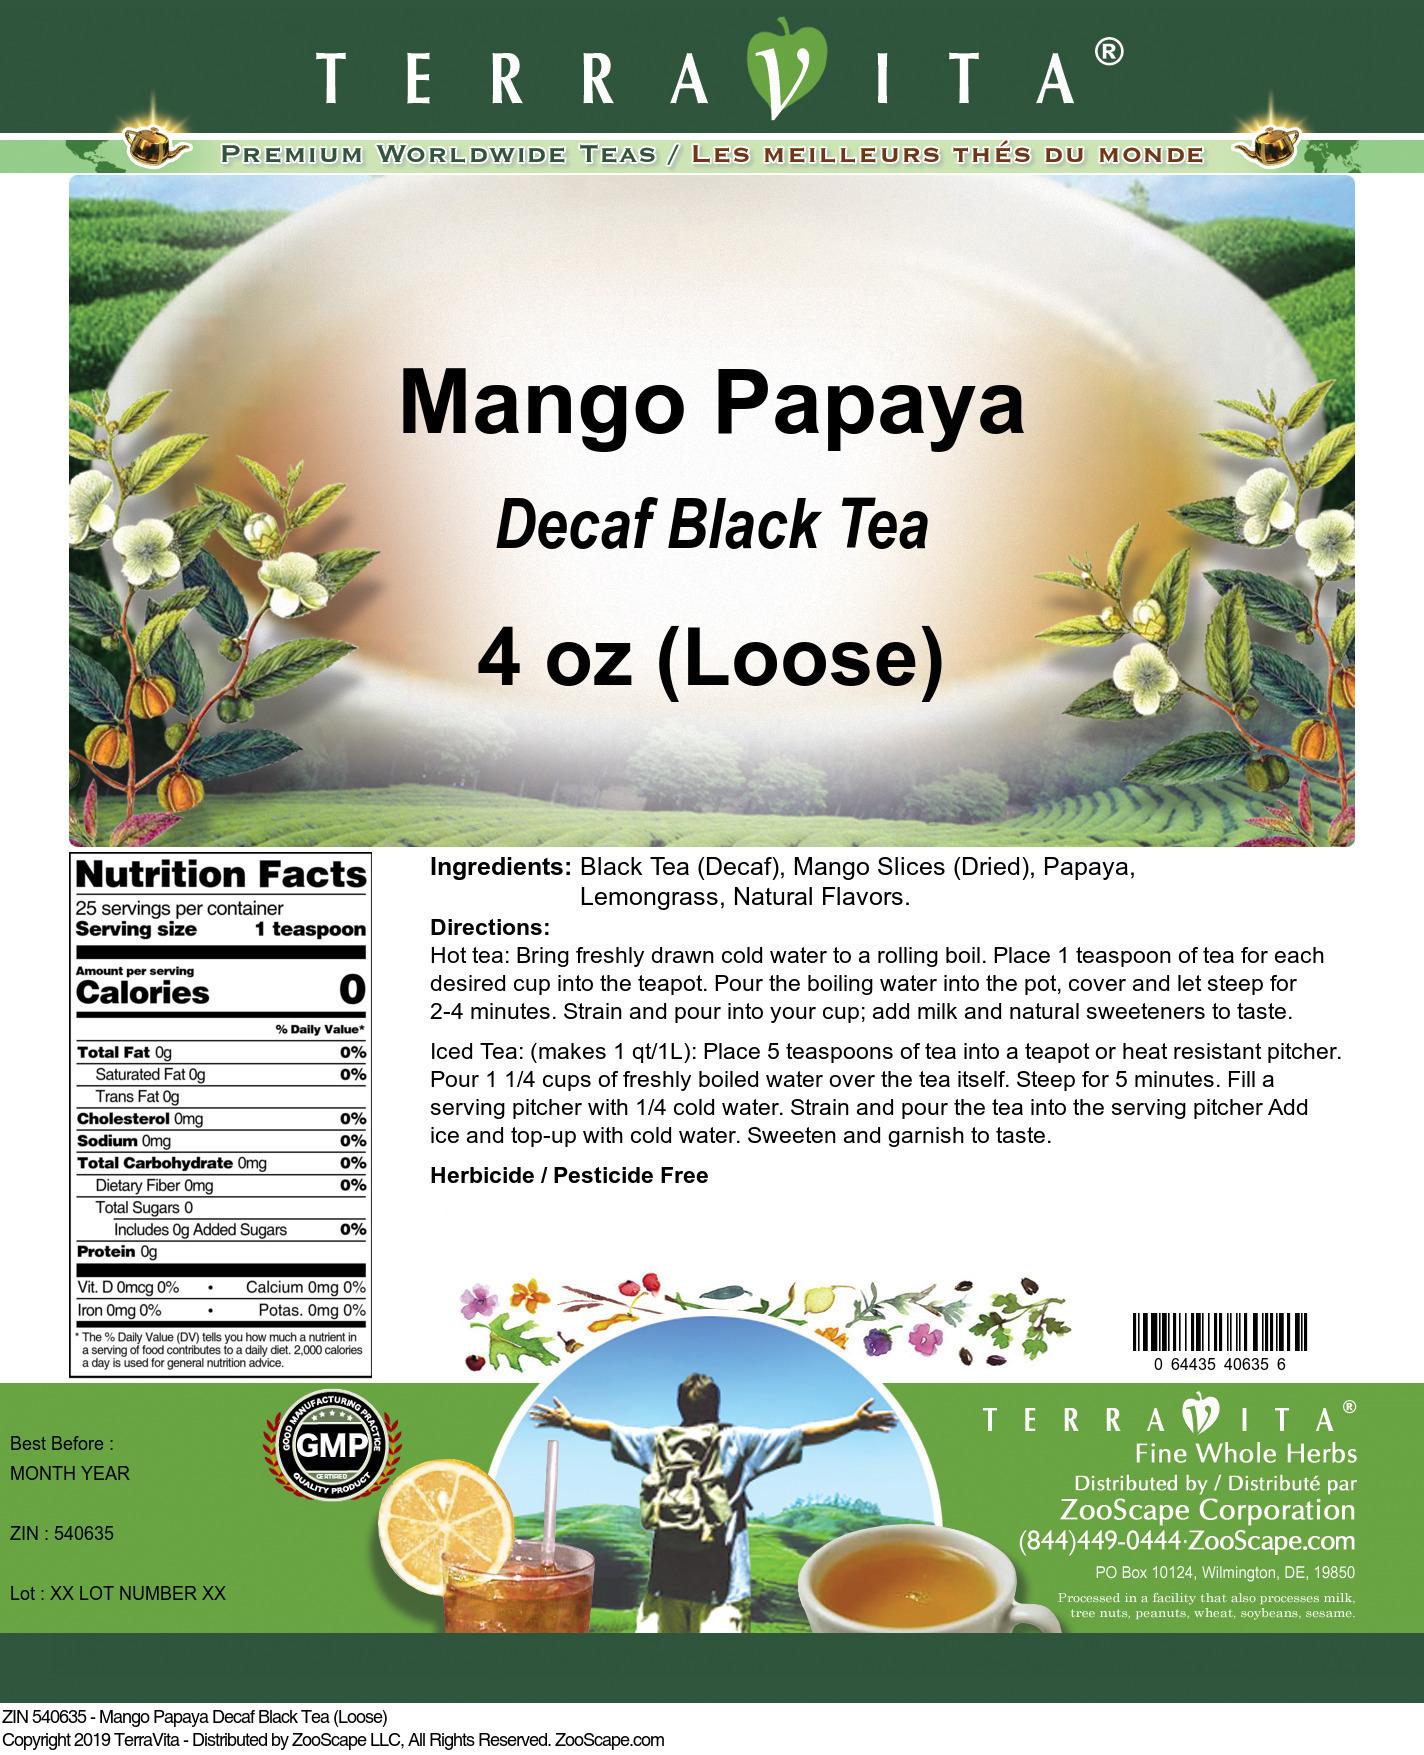 Mango Papaya Decaf Black Tea (Loose)